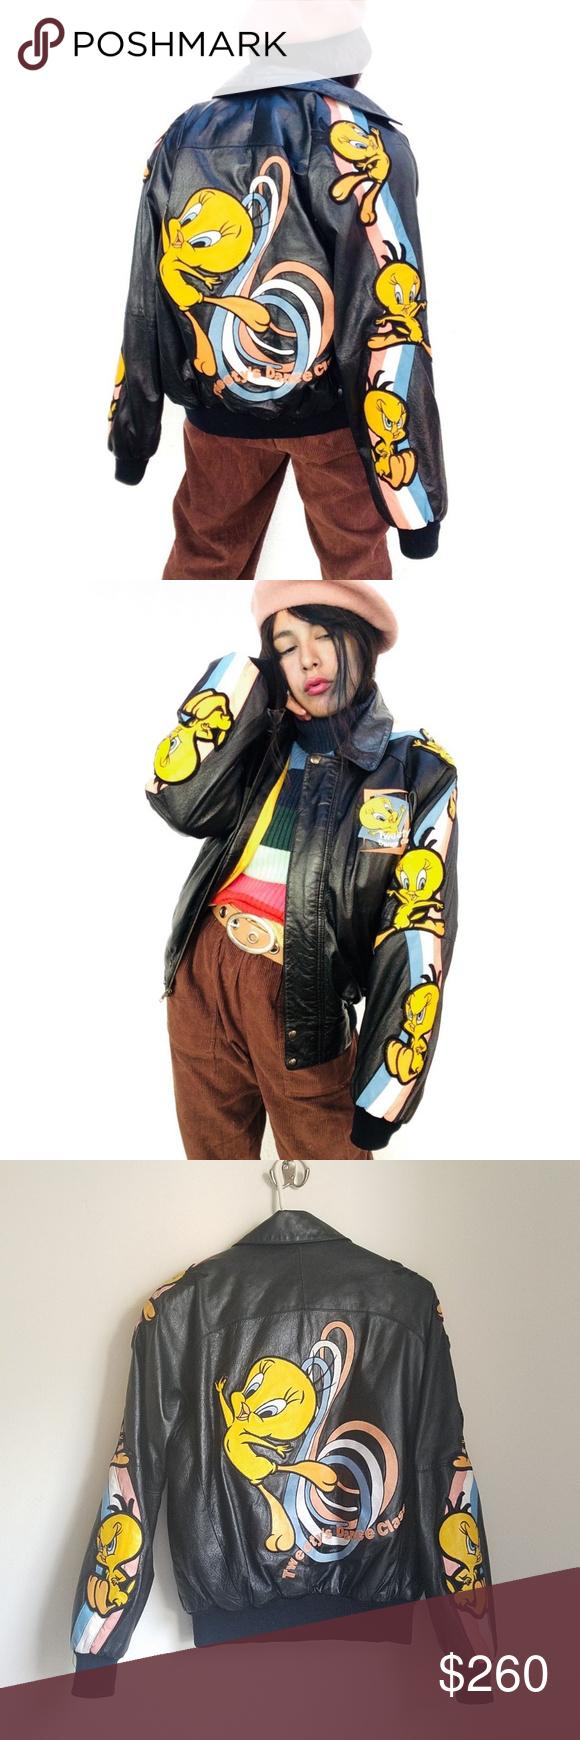 Vtg 90s Looney Tunes Rainbow Tweety Leather Jacket Dreamy Vtg 90s Looney Tunes Tweety Pastel Rainbow Stripes Leath Leather Bomber Jacket Vintage Jacket Jackets [ 1740 x 580 Pixel ]